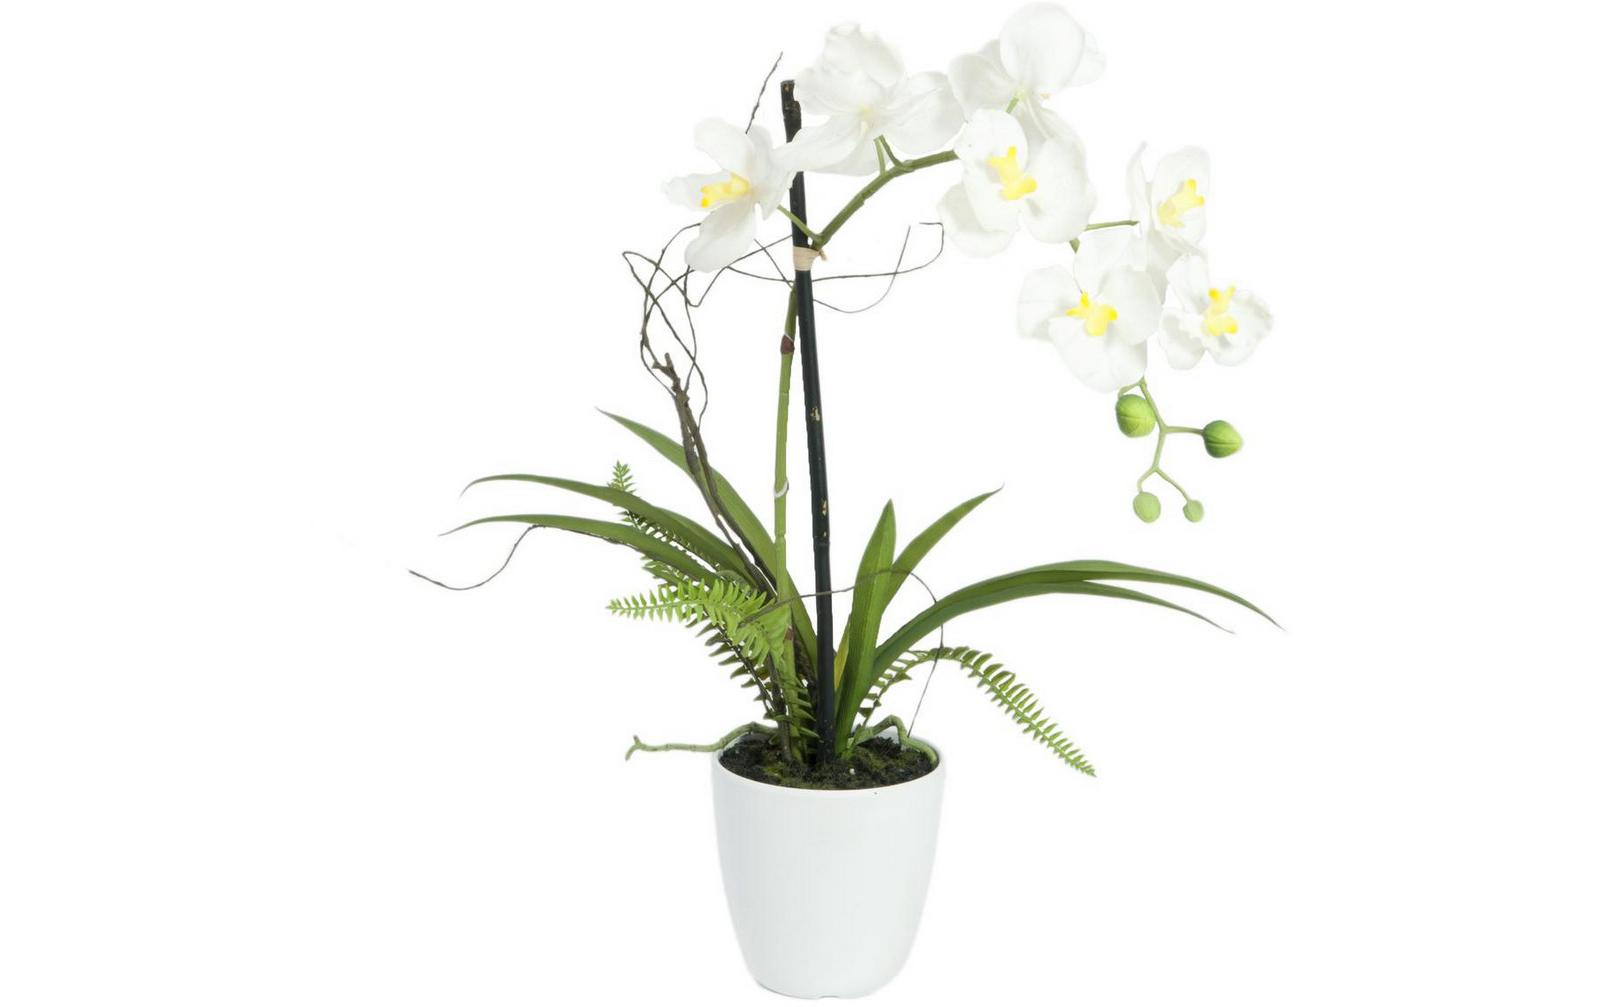 europalms-orchideen-arrangement-1-kunststoffpflanze